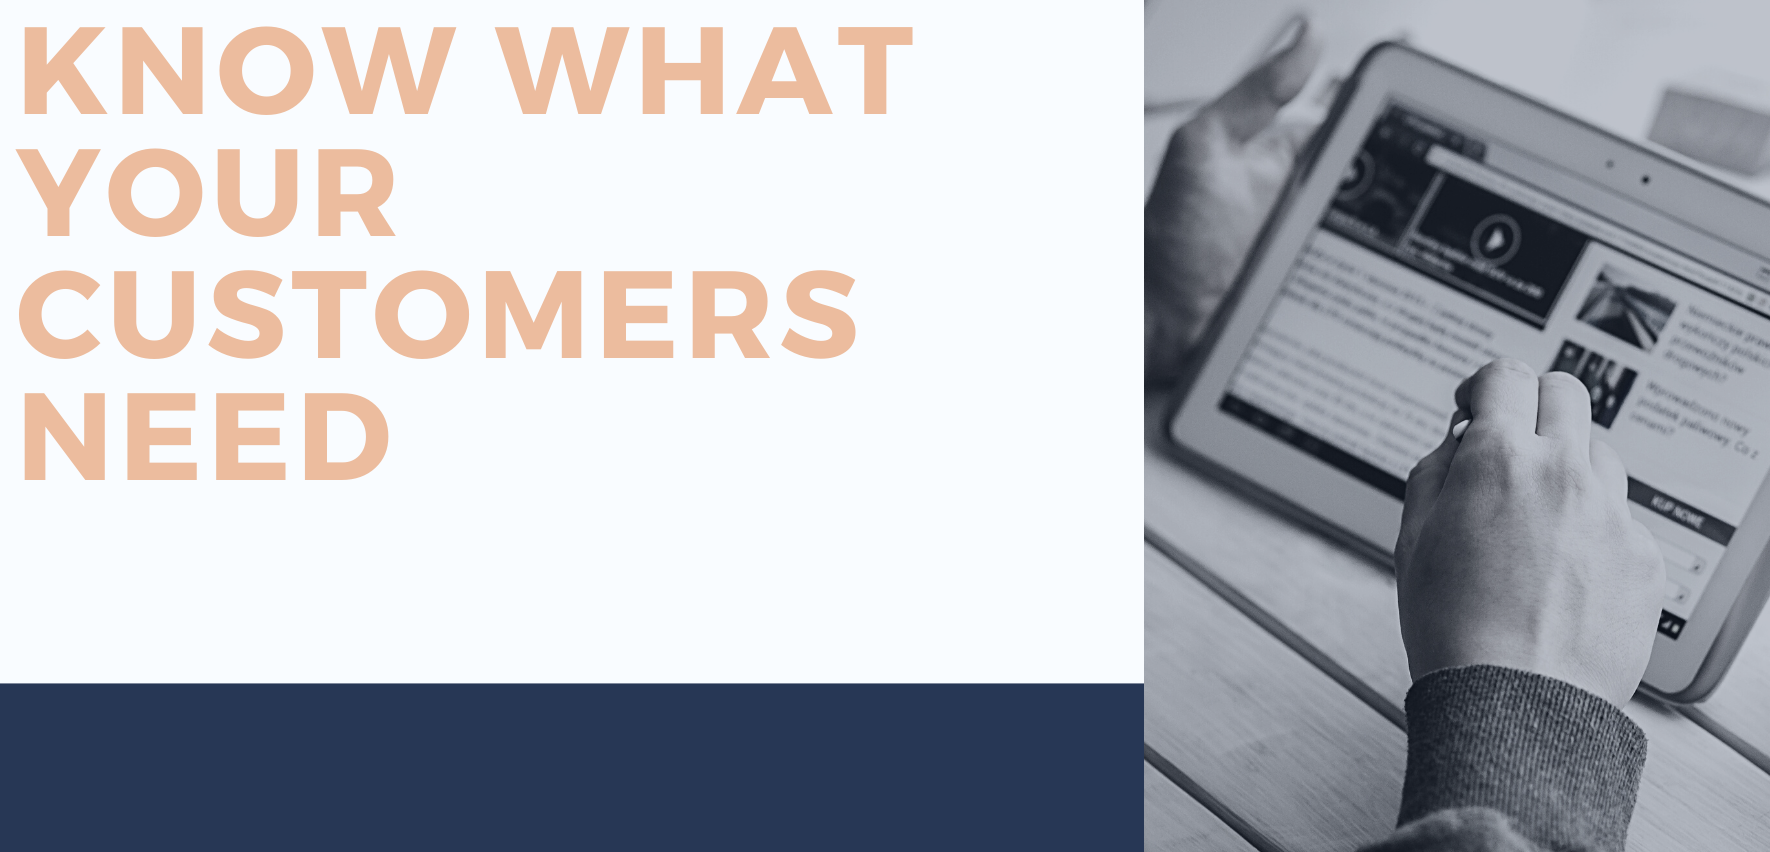 Brand Marketing KPI customers need